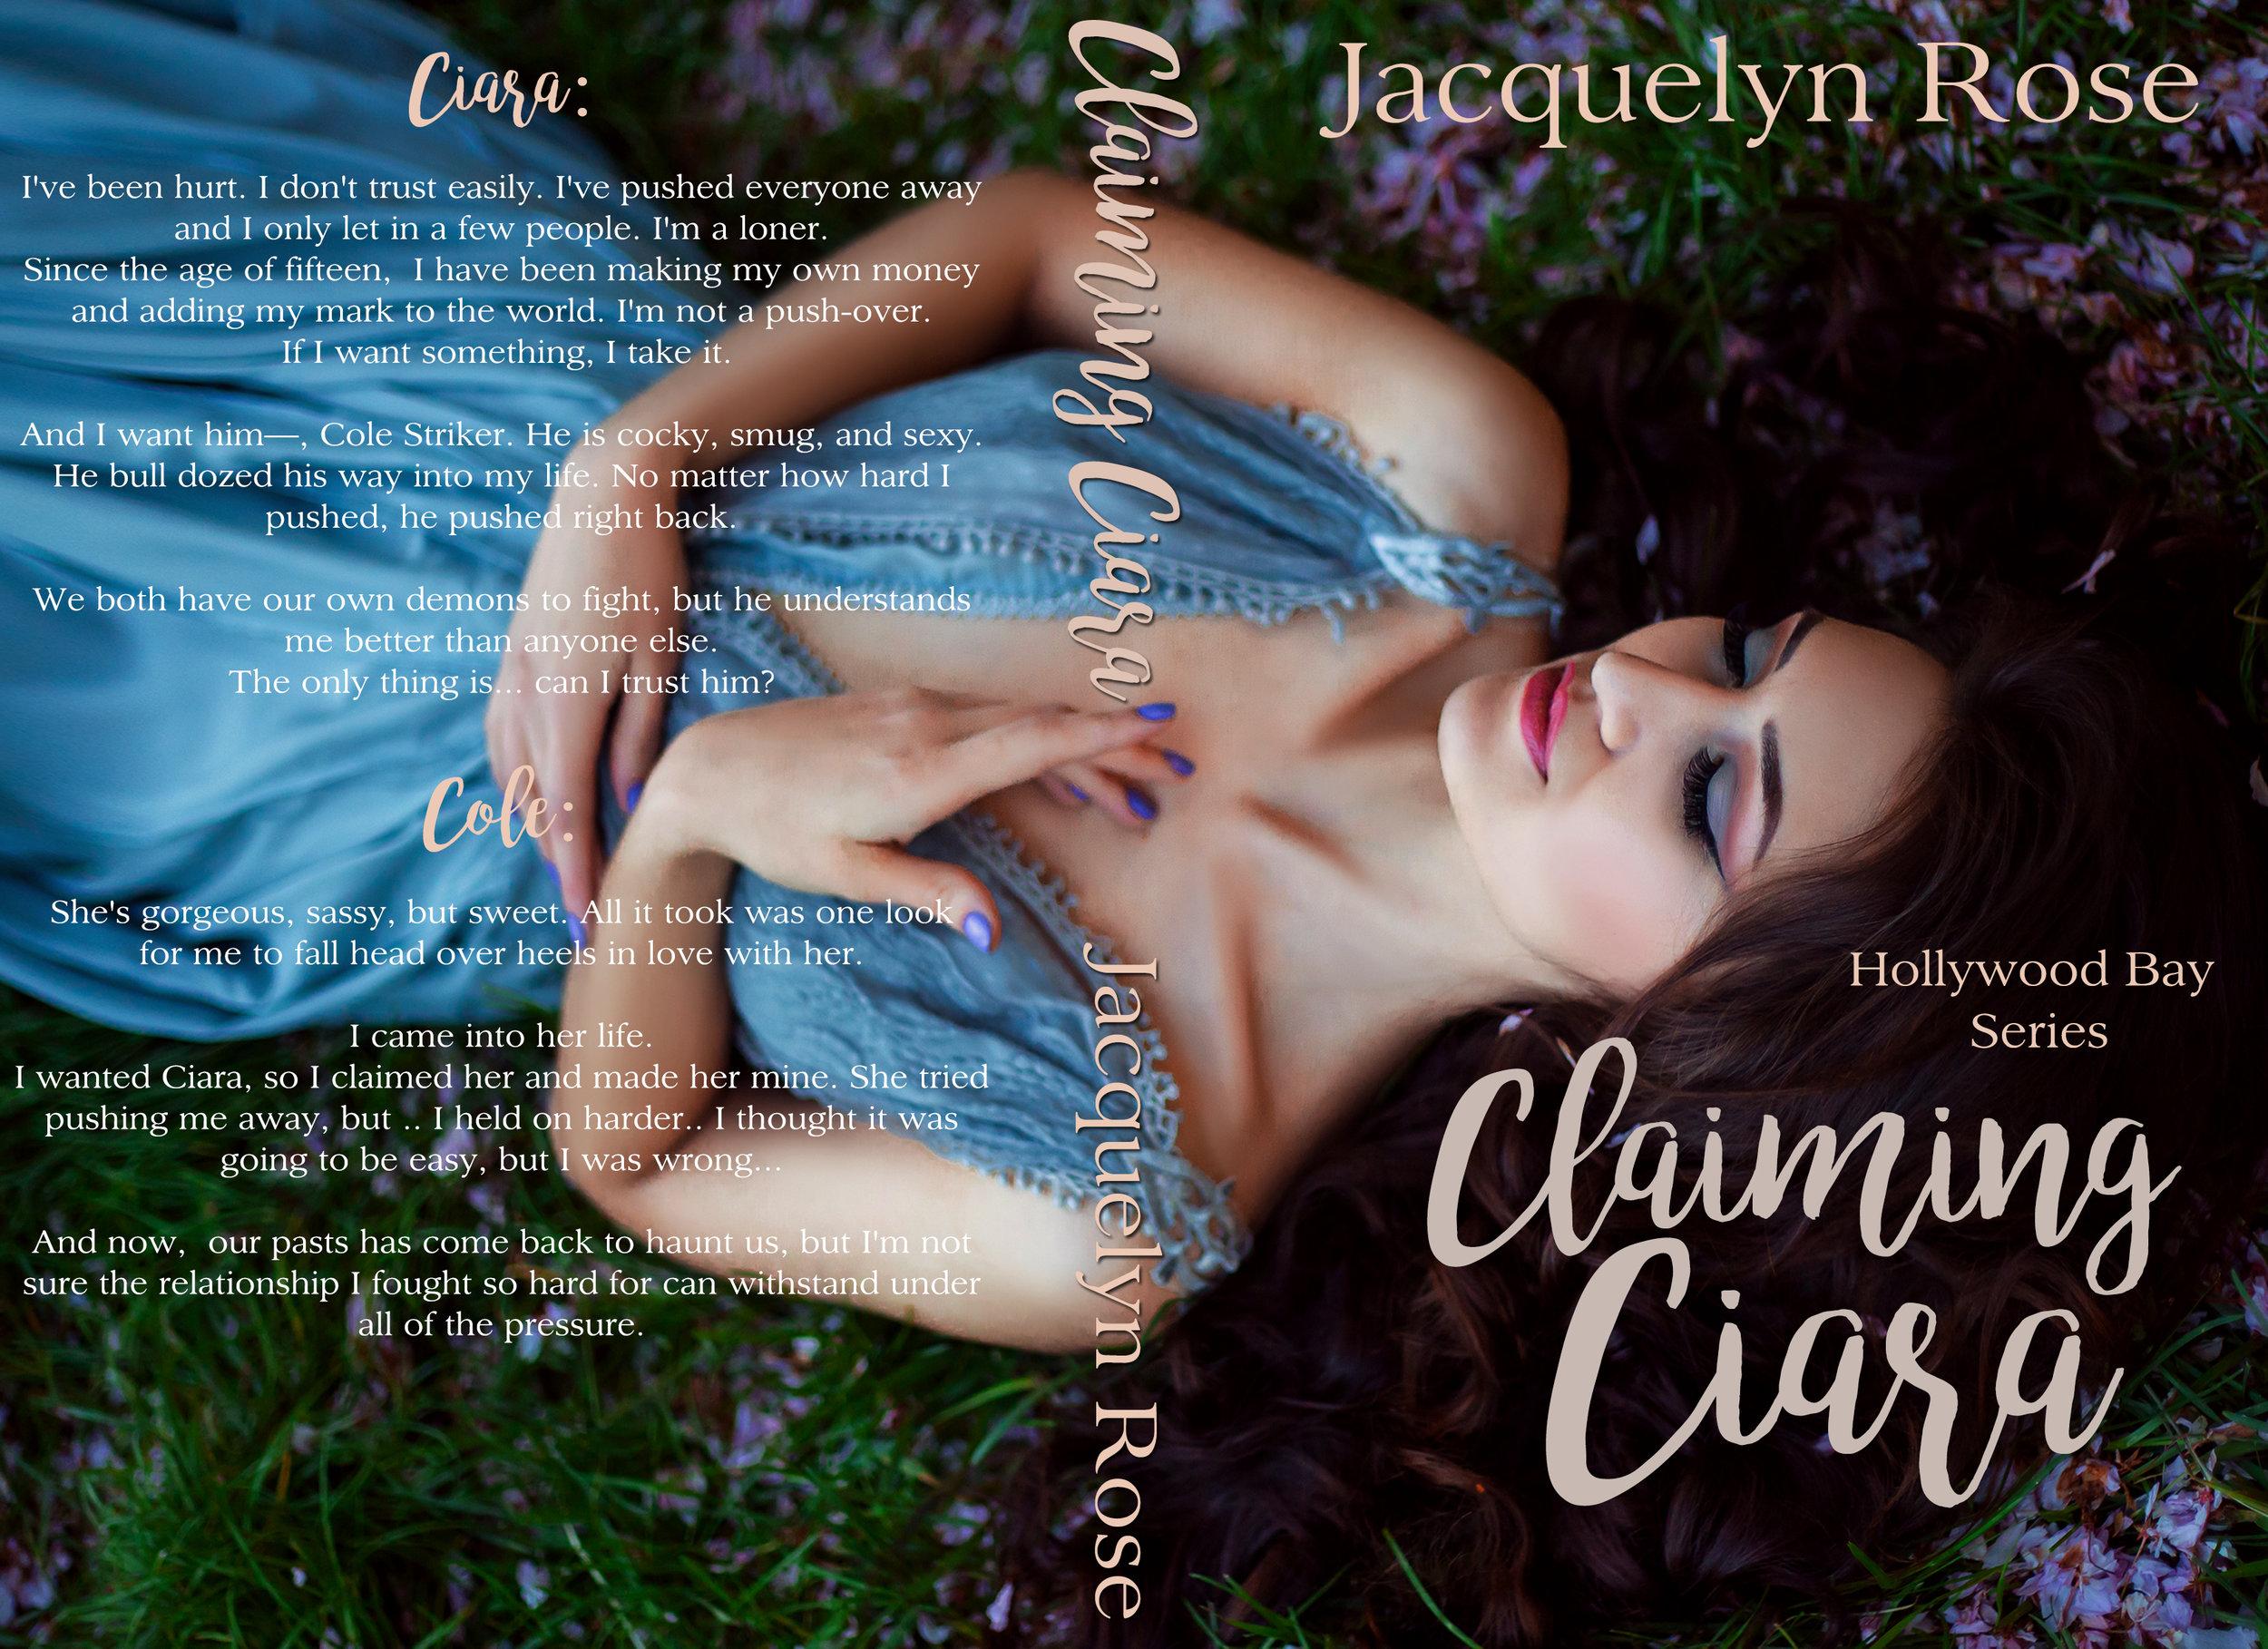 Claiming ciara2.jpg